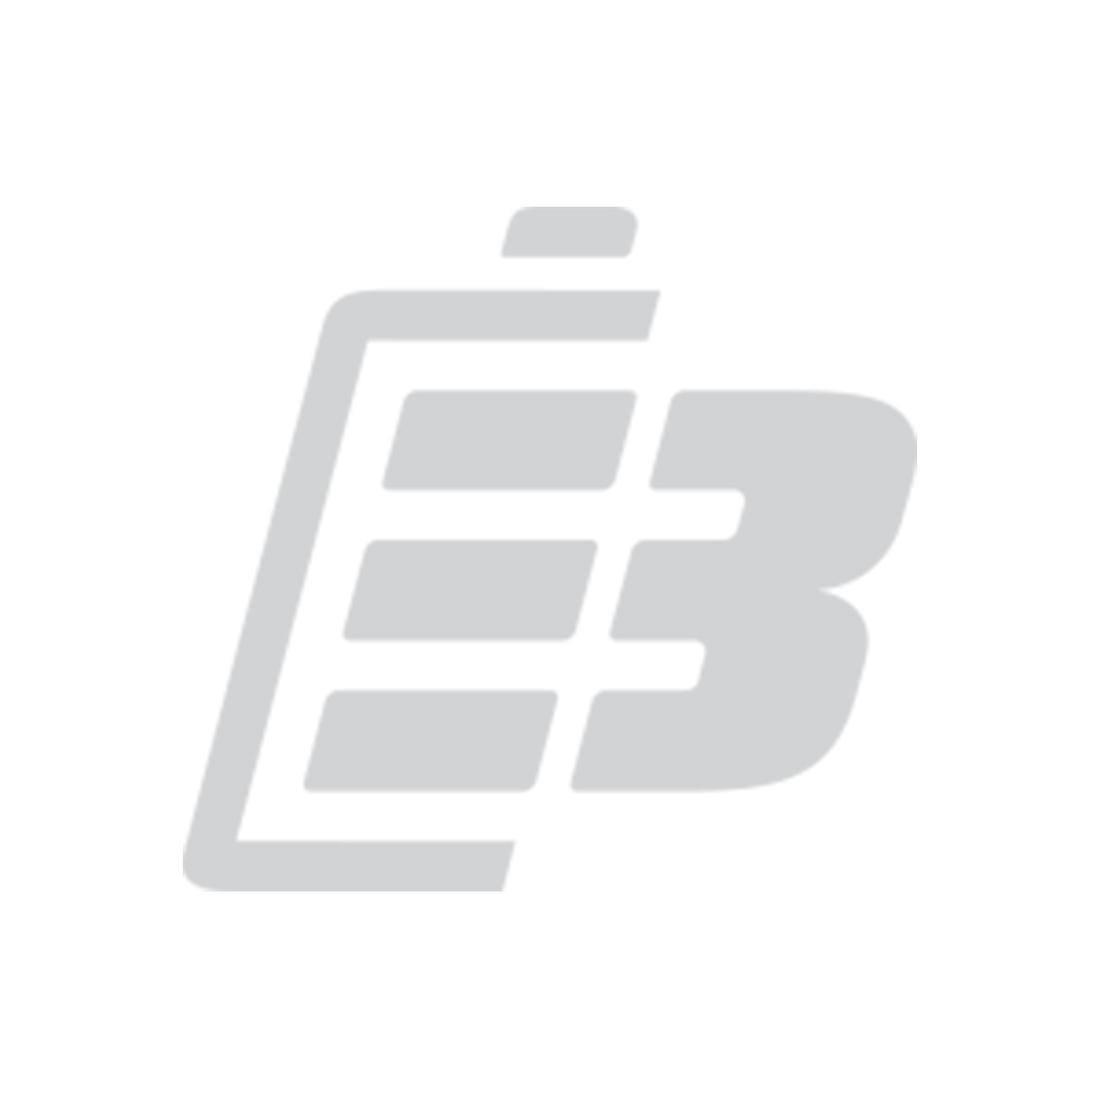 Barcode scanner battery Symbol MC9000_1